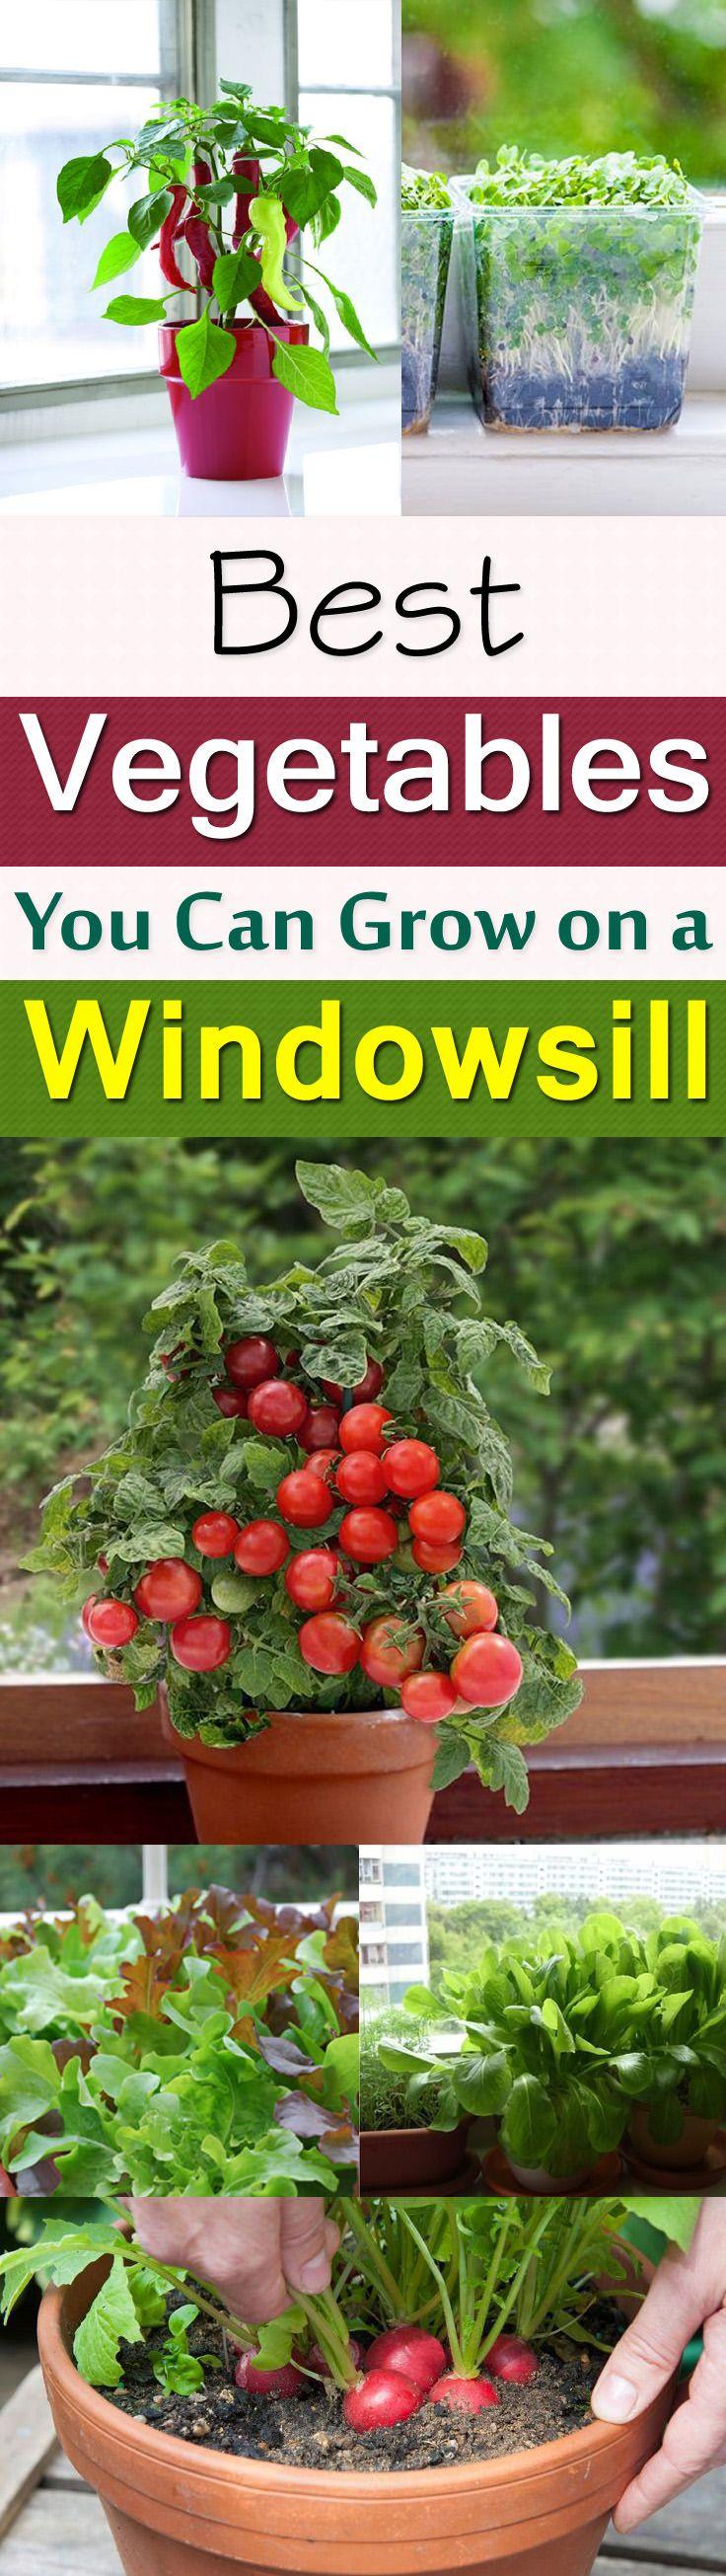 11 Best Vegetables To Grow On Windowsill Organic